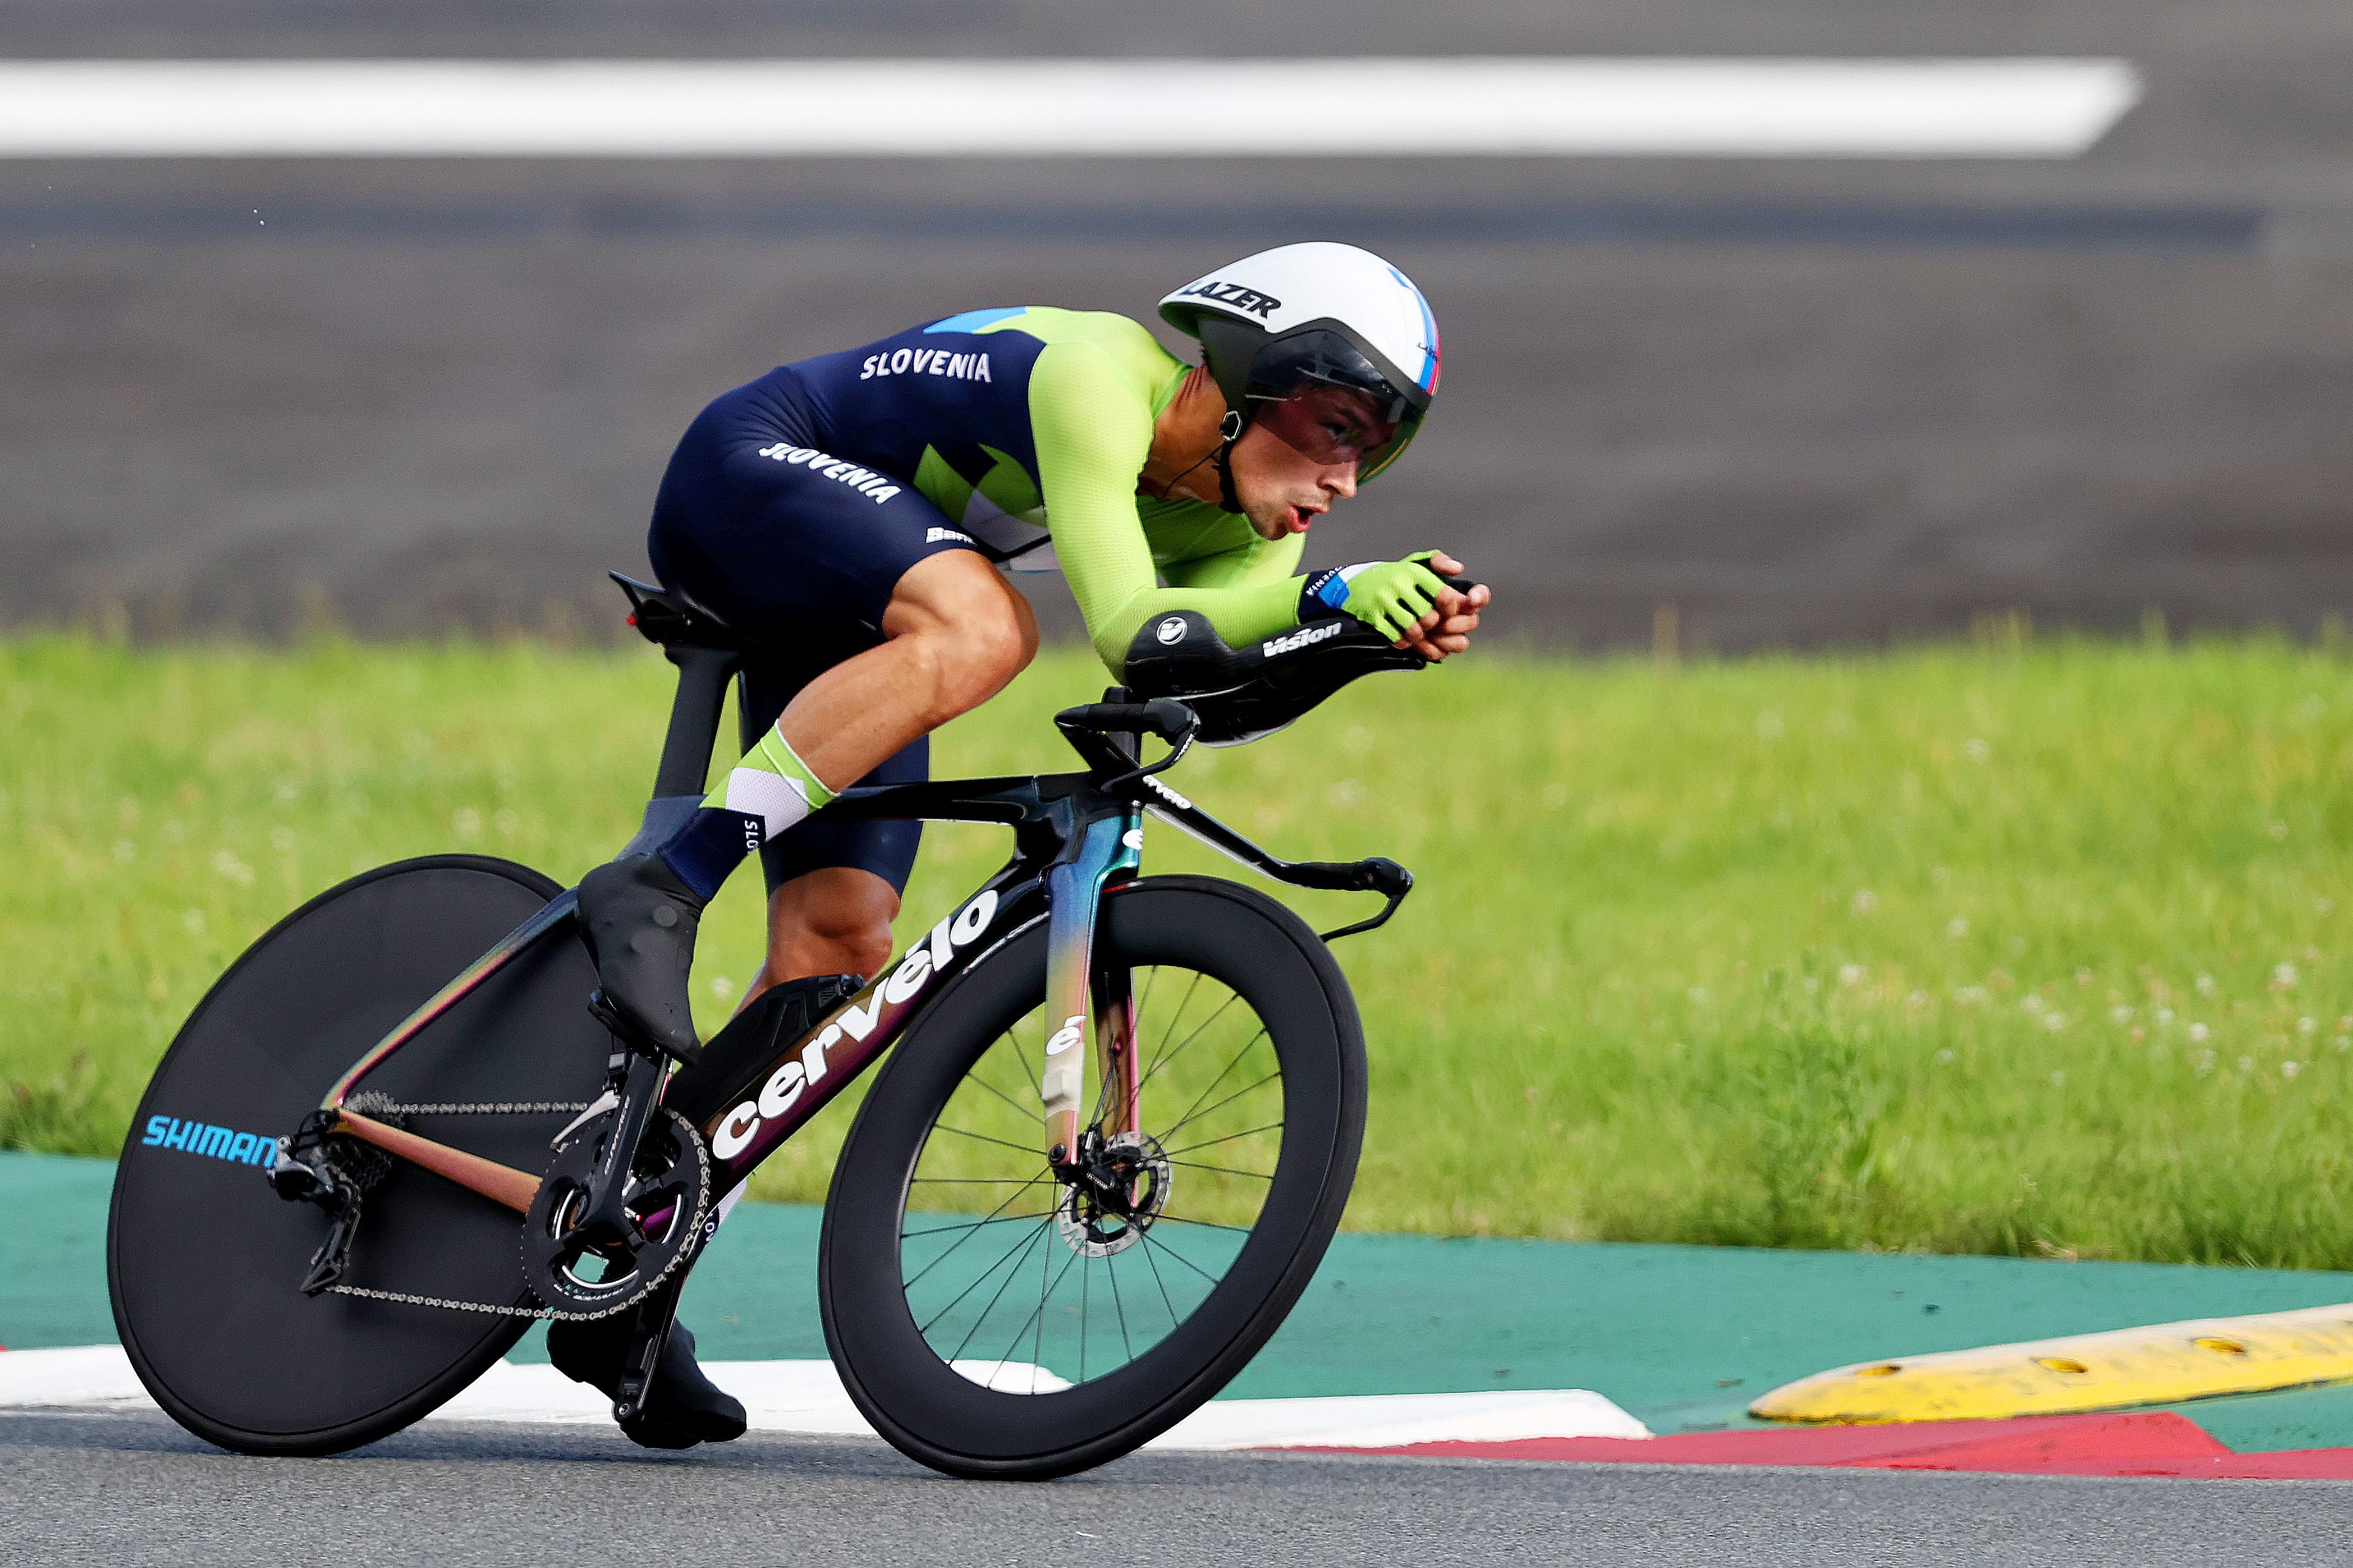 Tokyo 2021 men's individual time trial